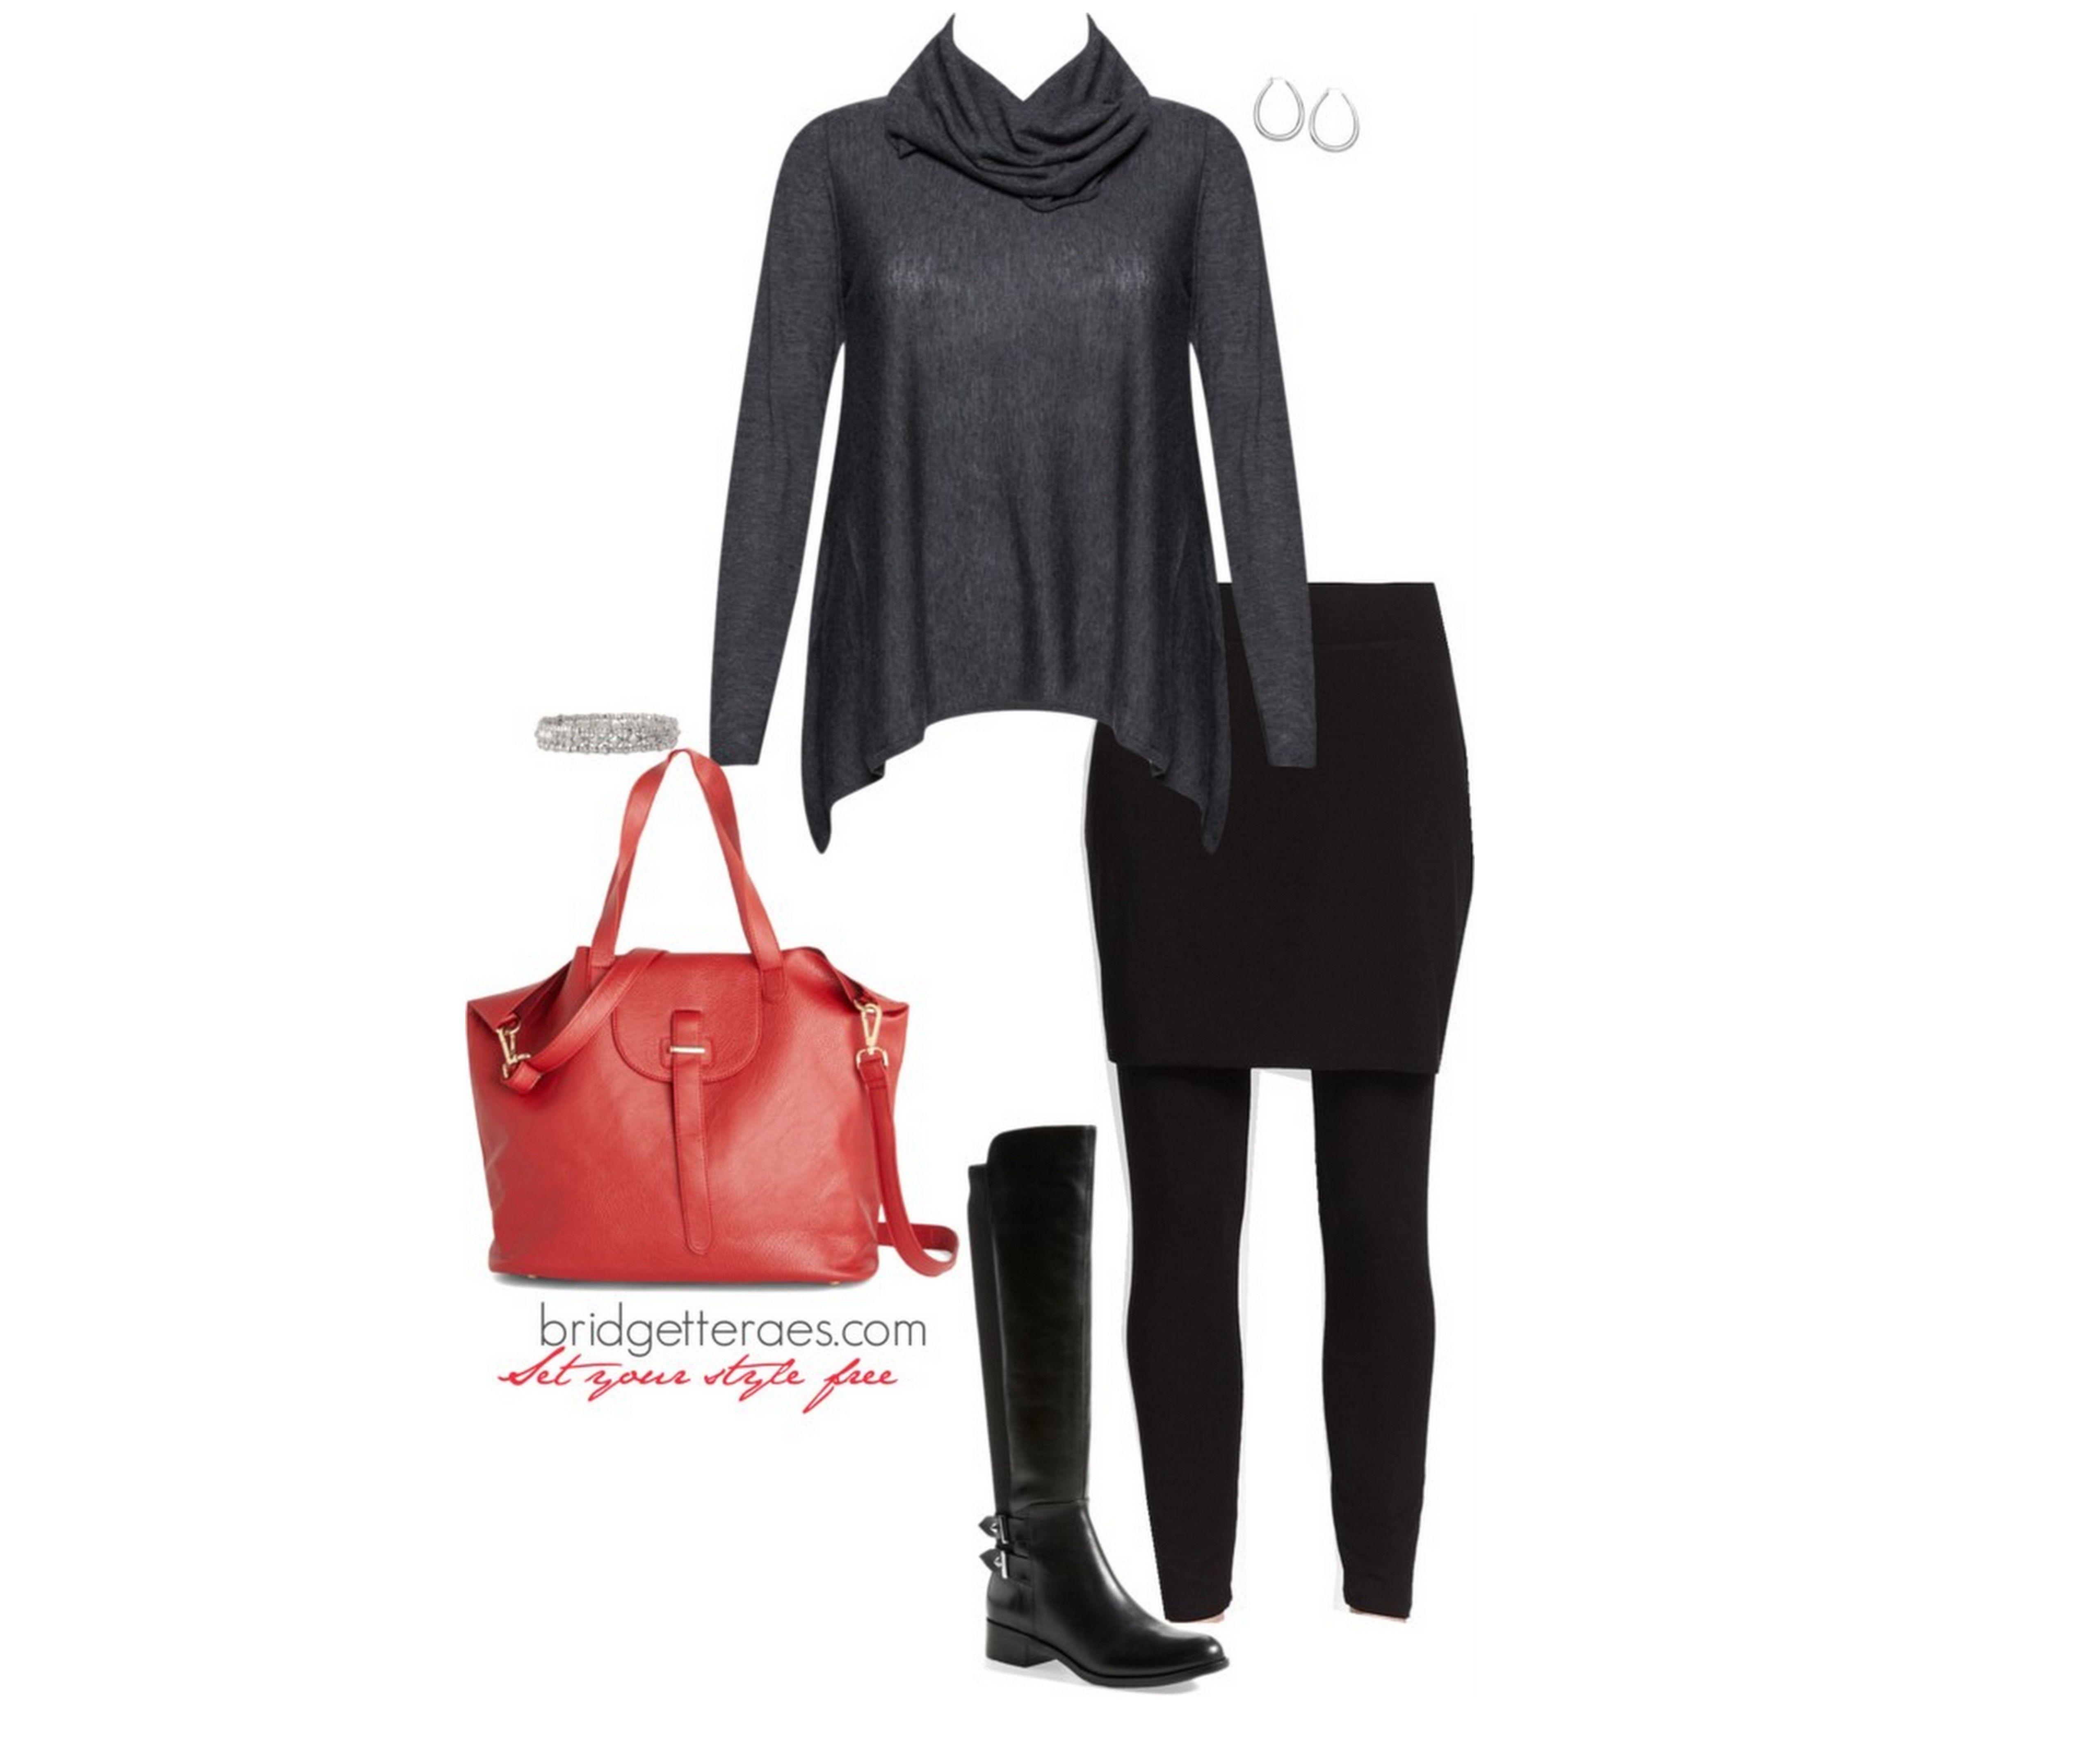 aa3d1888225106 How to Wear Skeggings (Skirted Leggings) - Bridgette Raes Style Expert